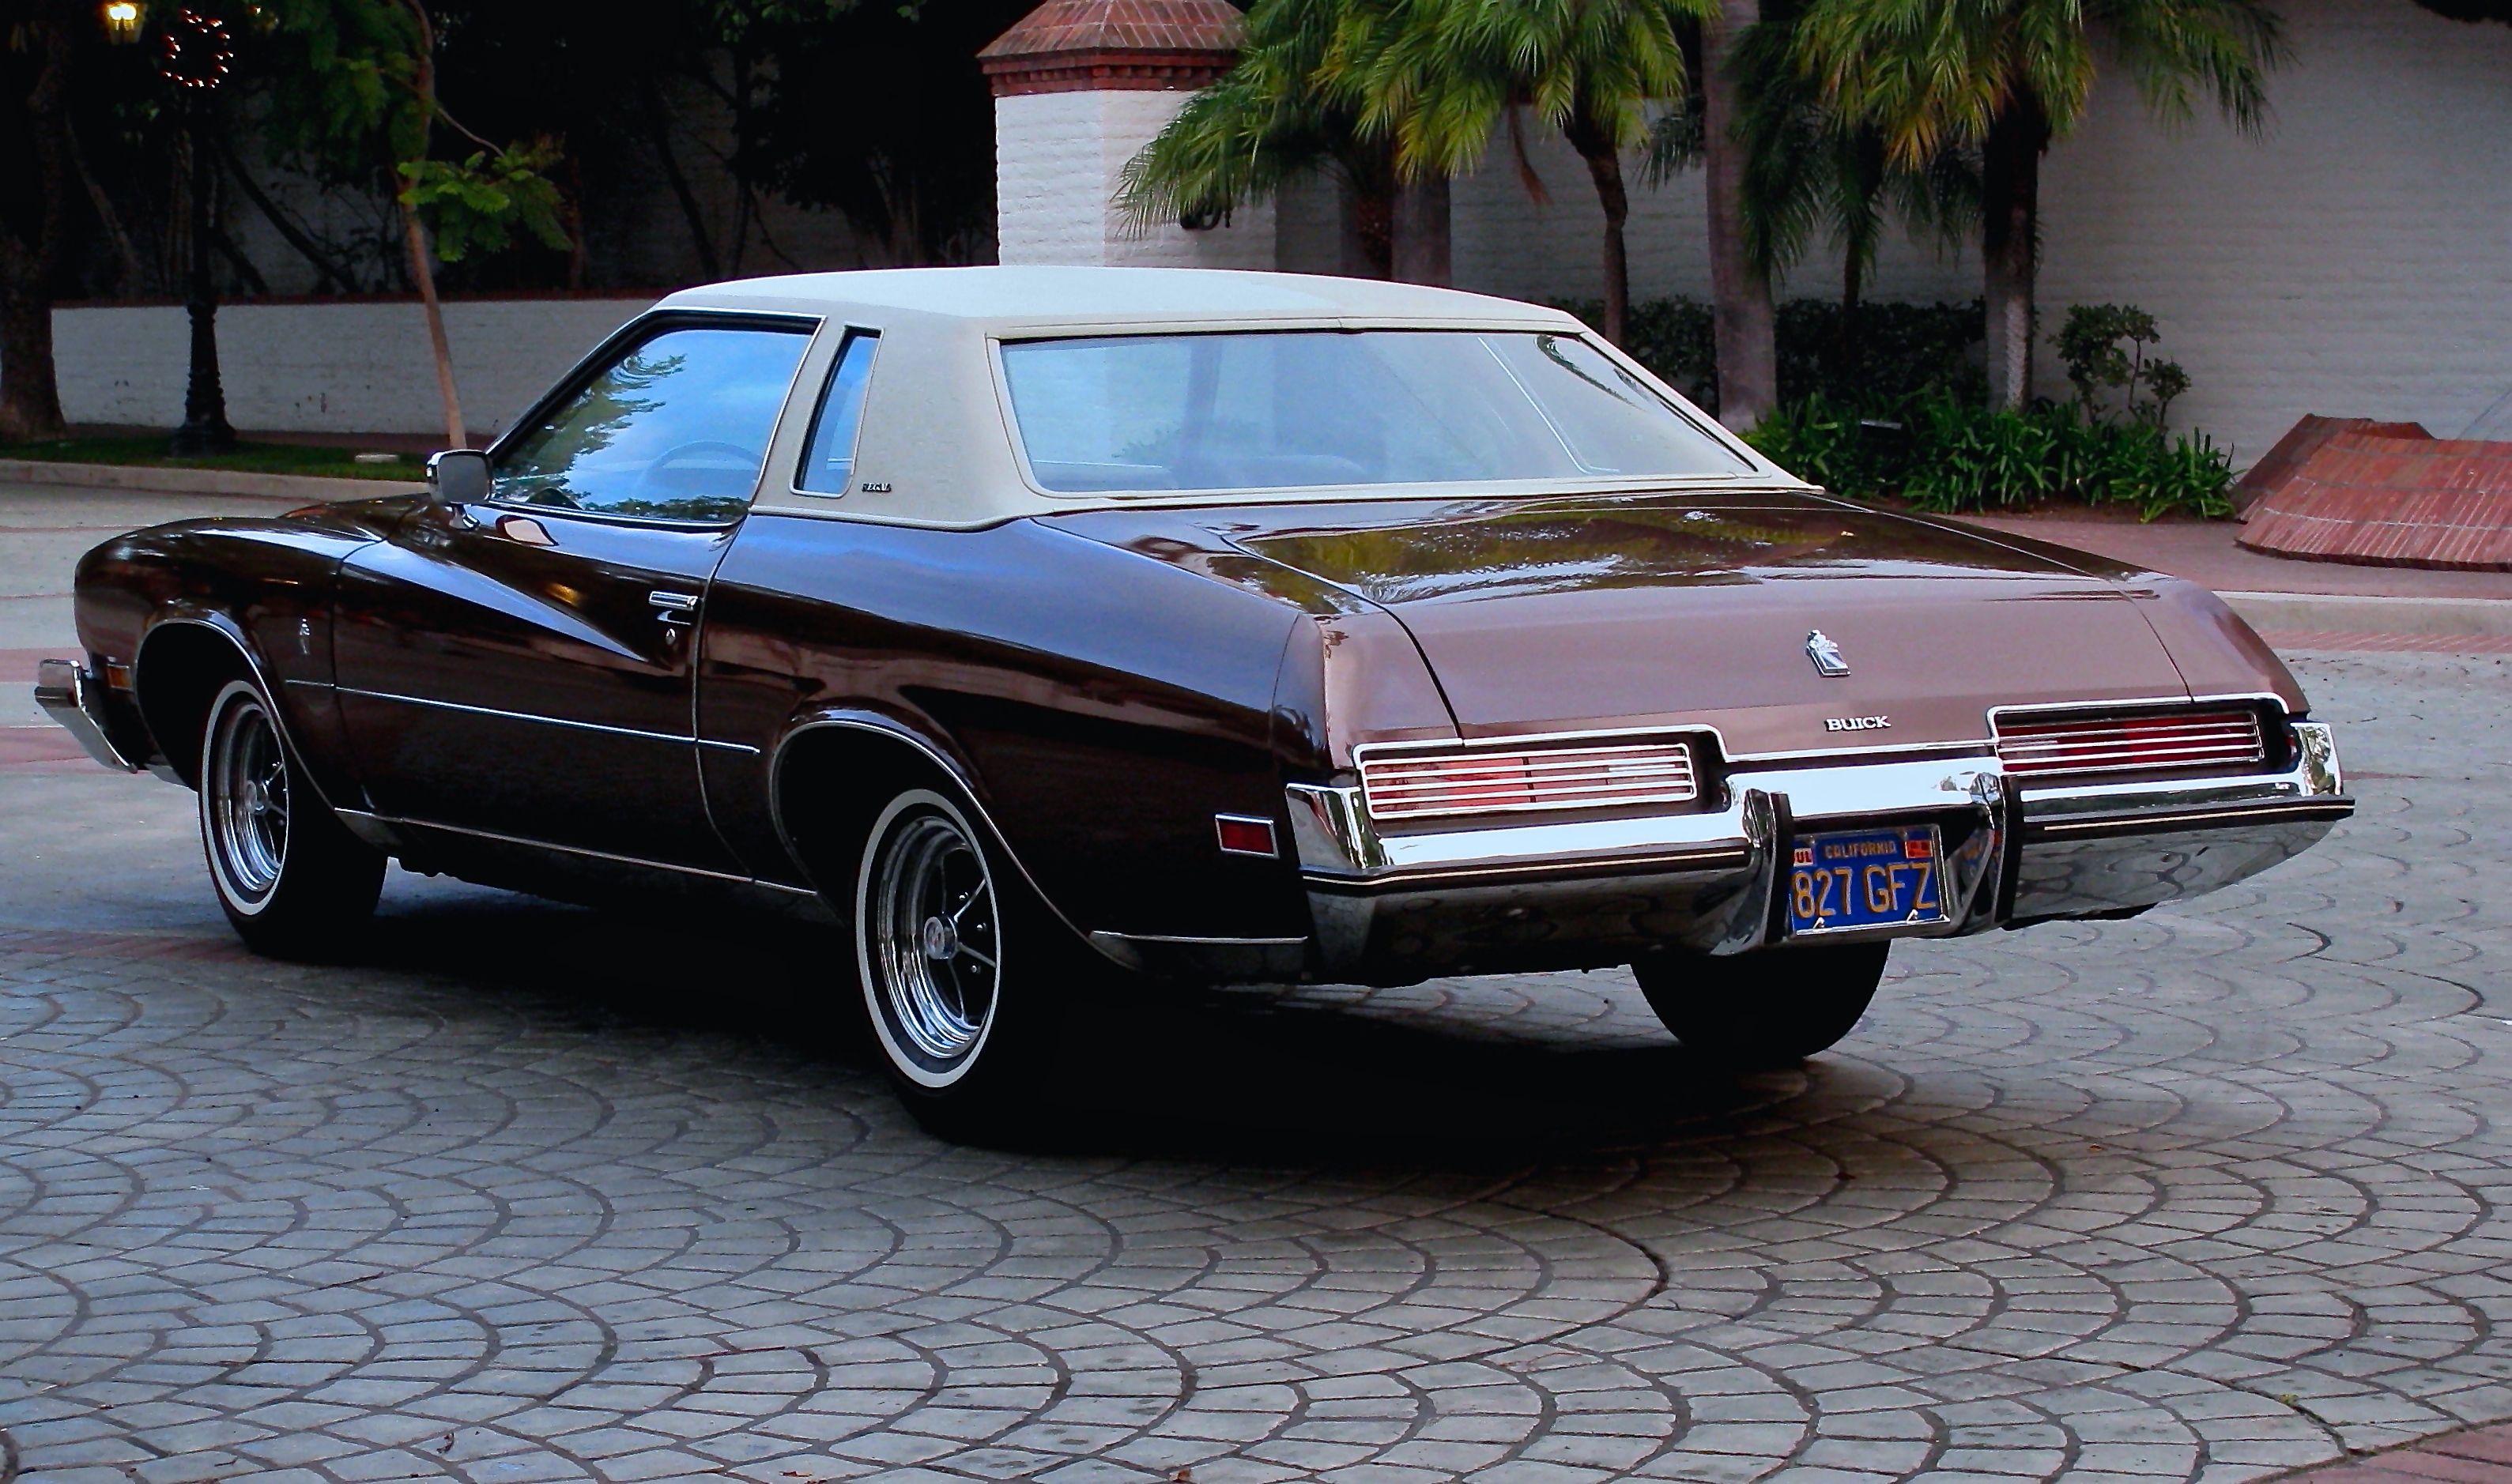 E Fbc Ce Aa D Aa B E on 1971 Buick Centurion